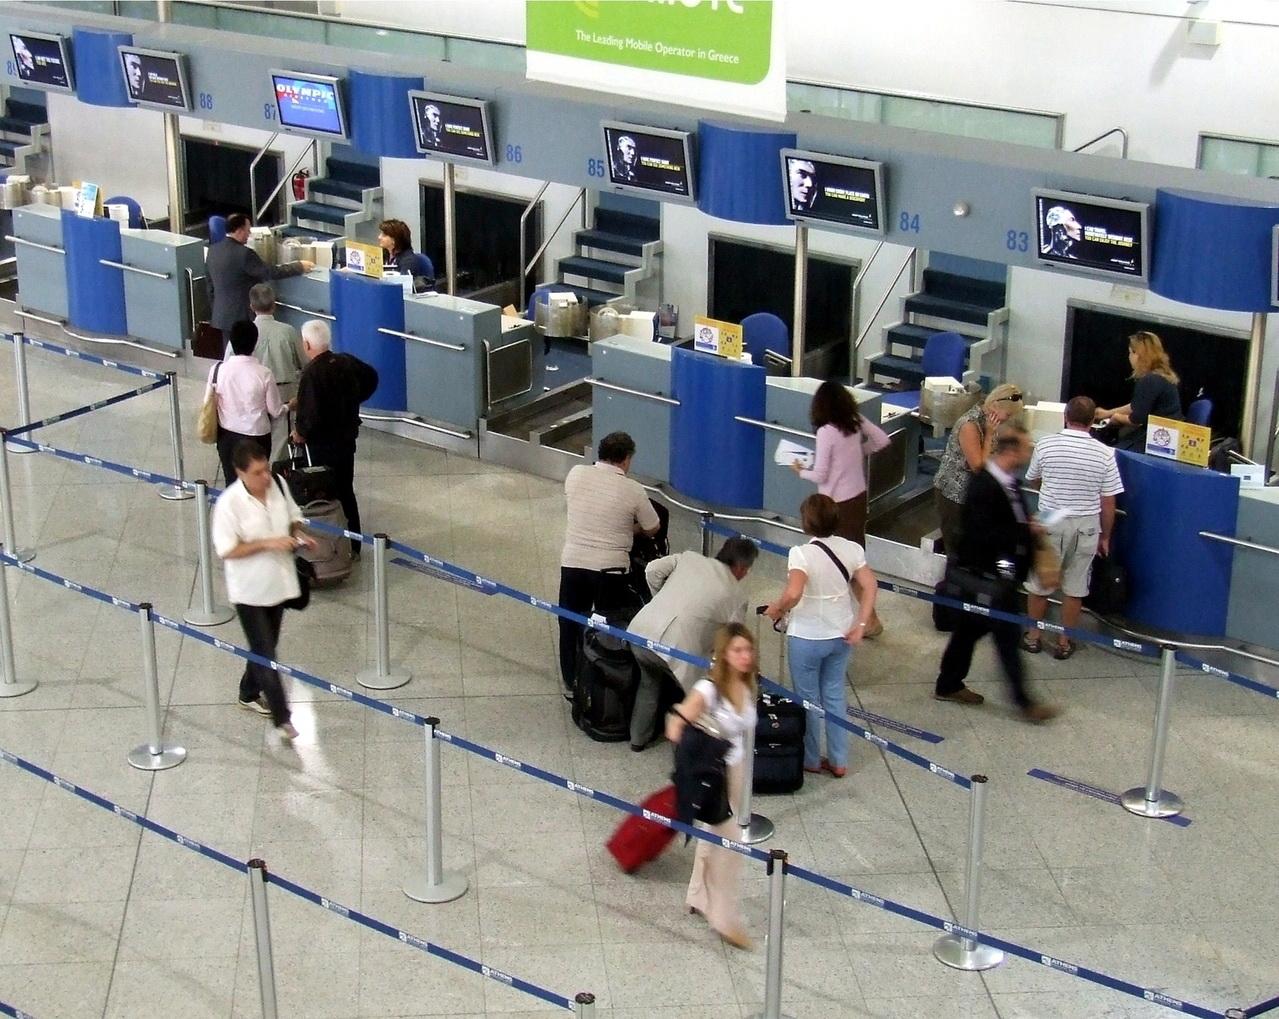 EU-PNR directive: Overlooking EU fundamental rights will not make Europe safer